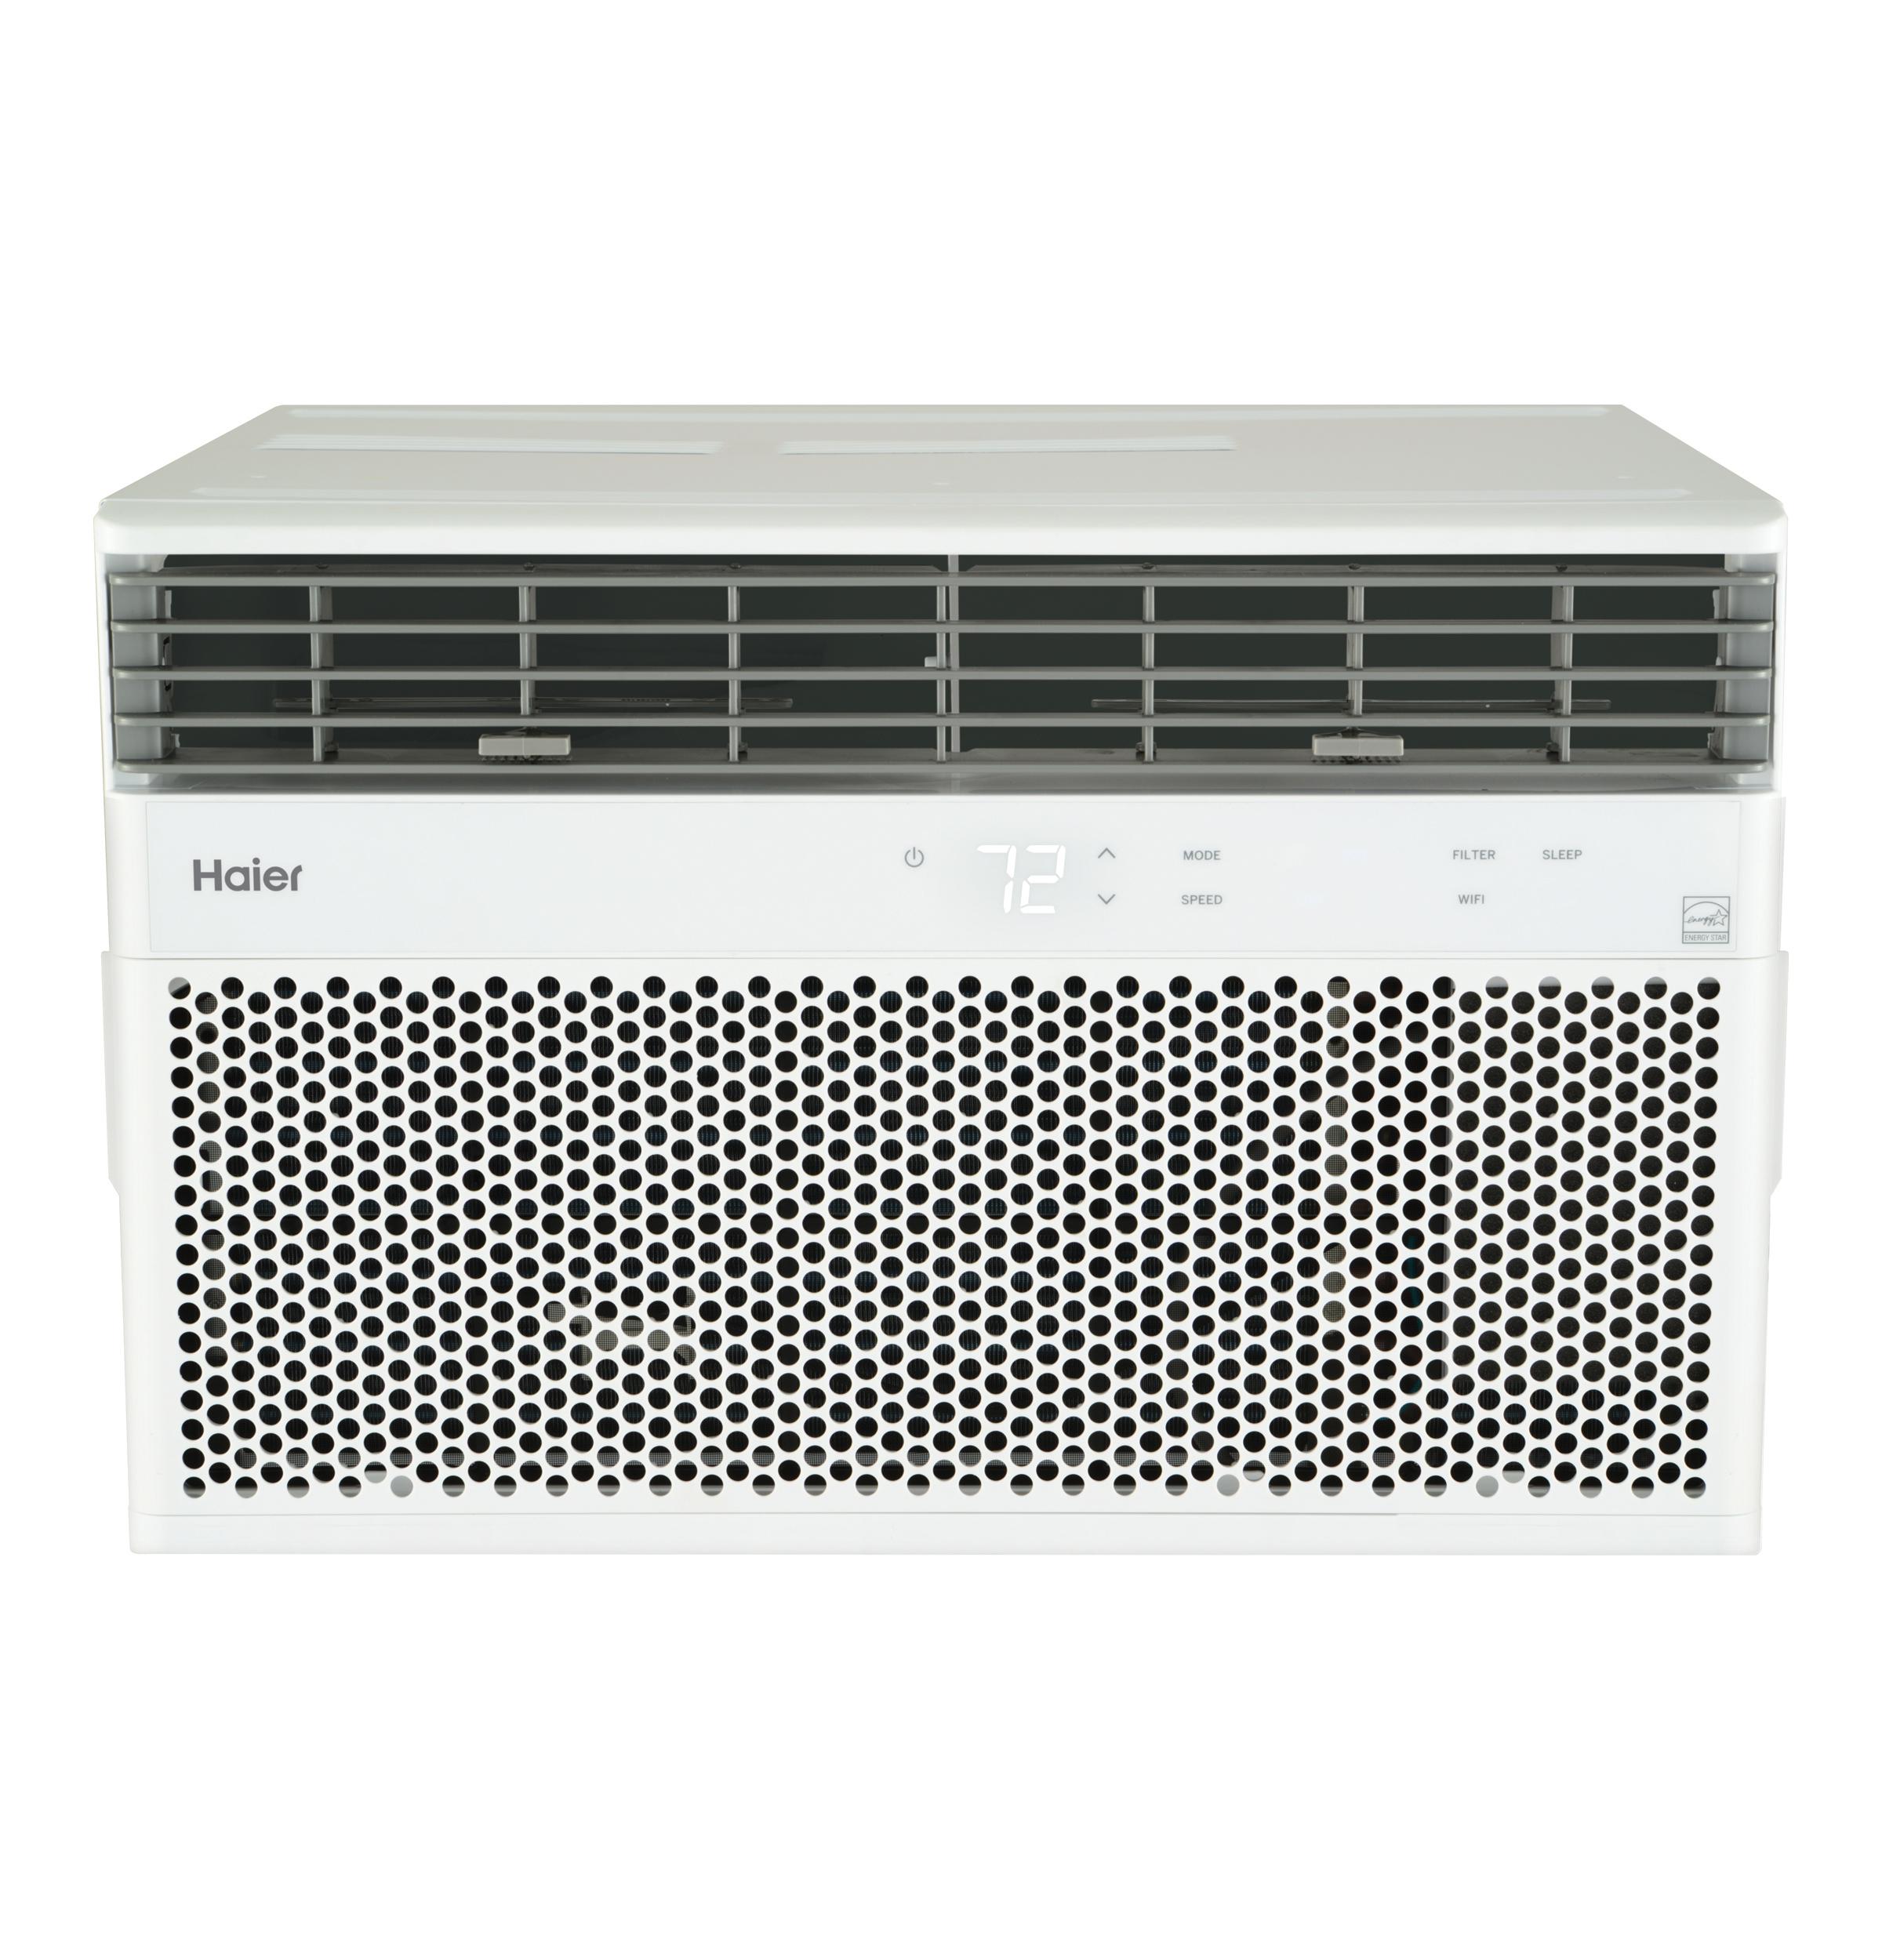 Haier Haier® ENERGY STAR® 18,000/17,800 BTU 230/208 Volt Smart Electronic Window Air Conditioner